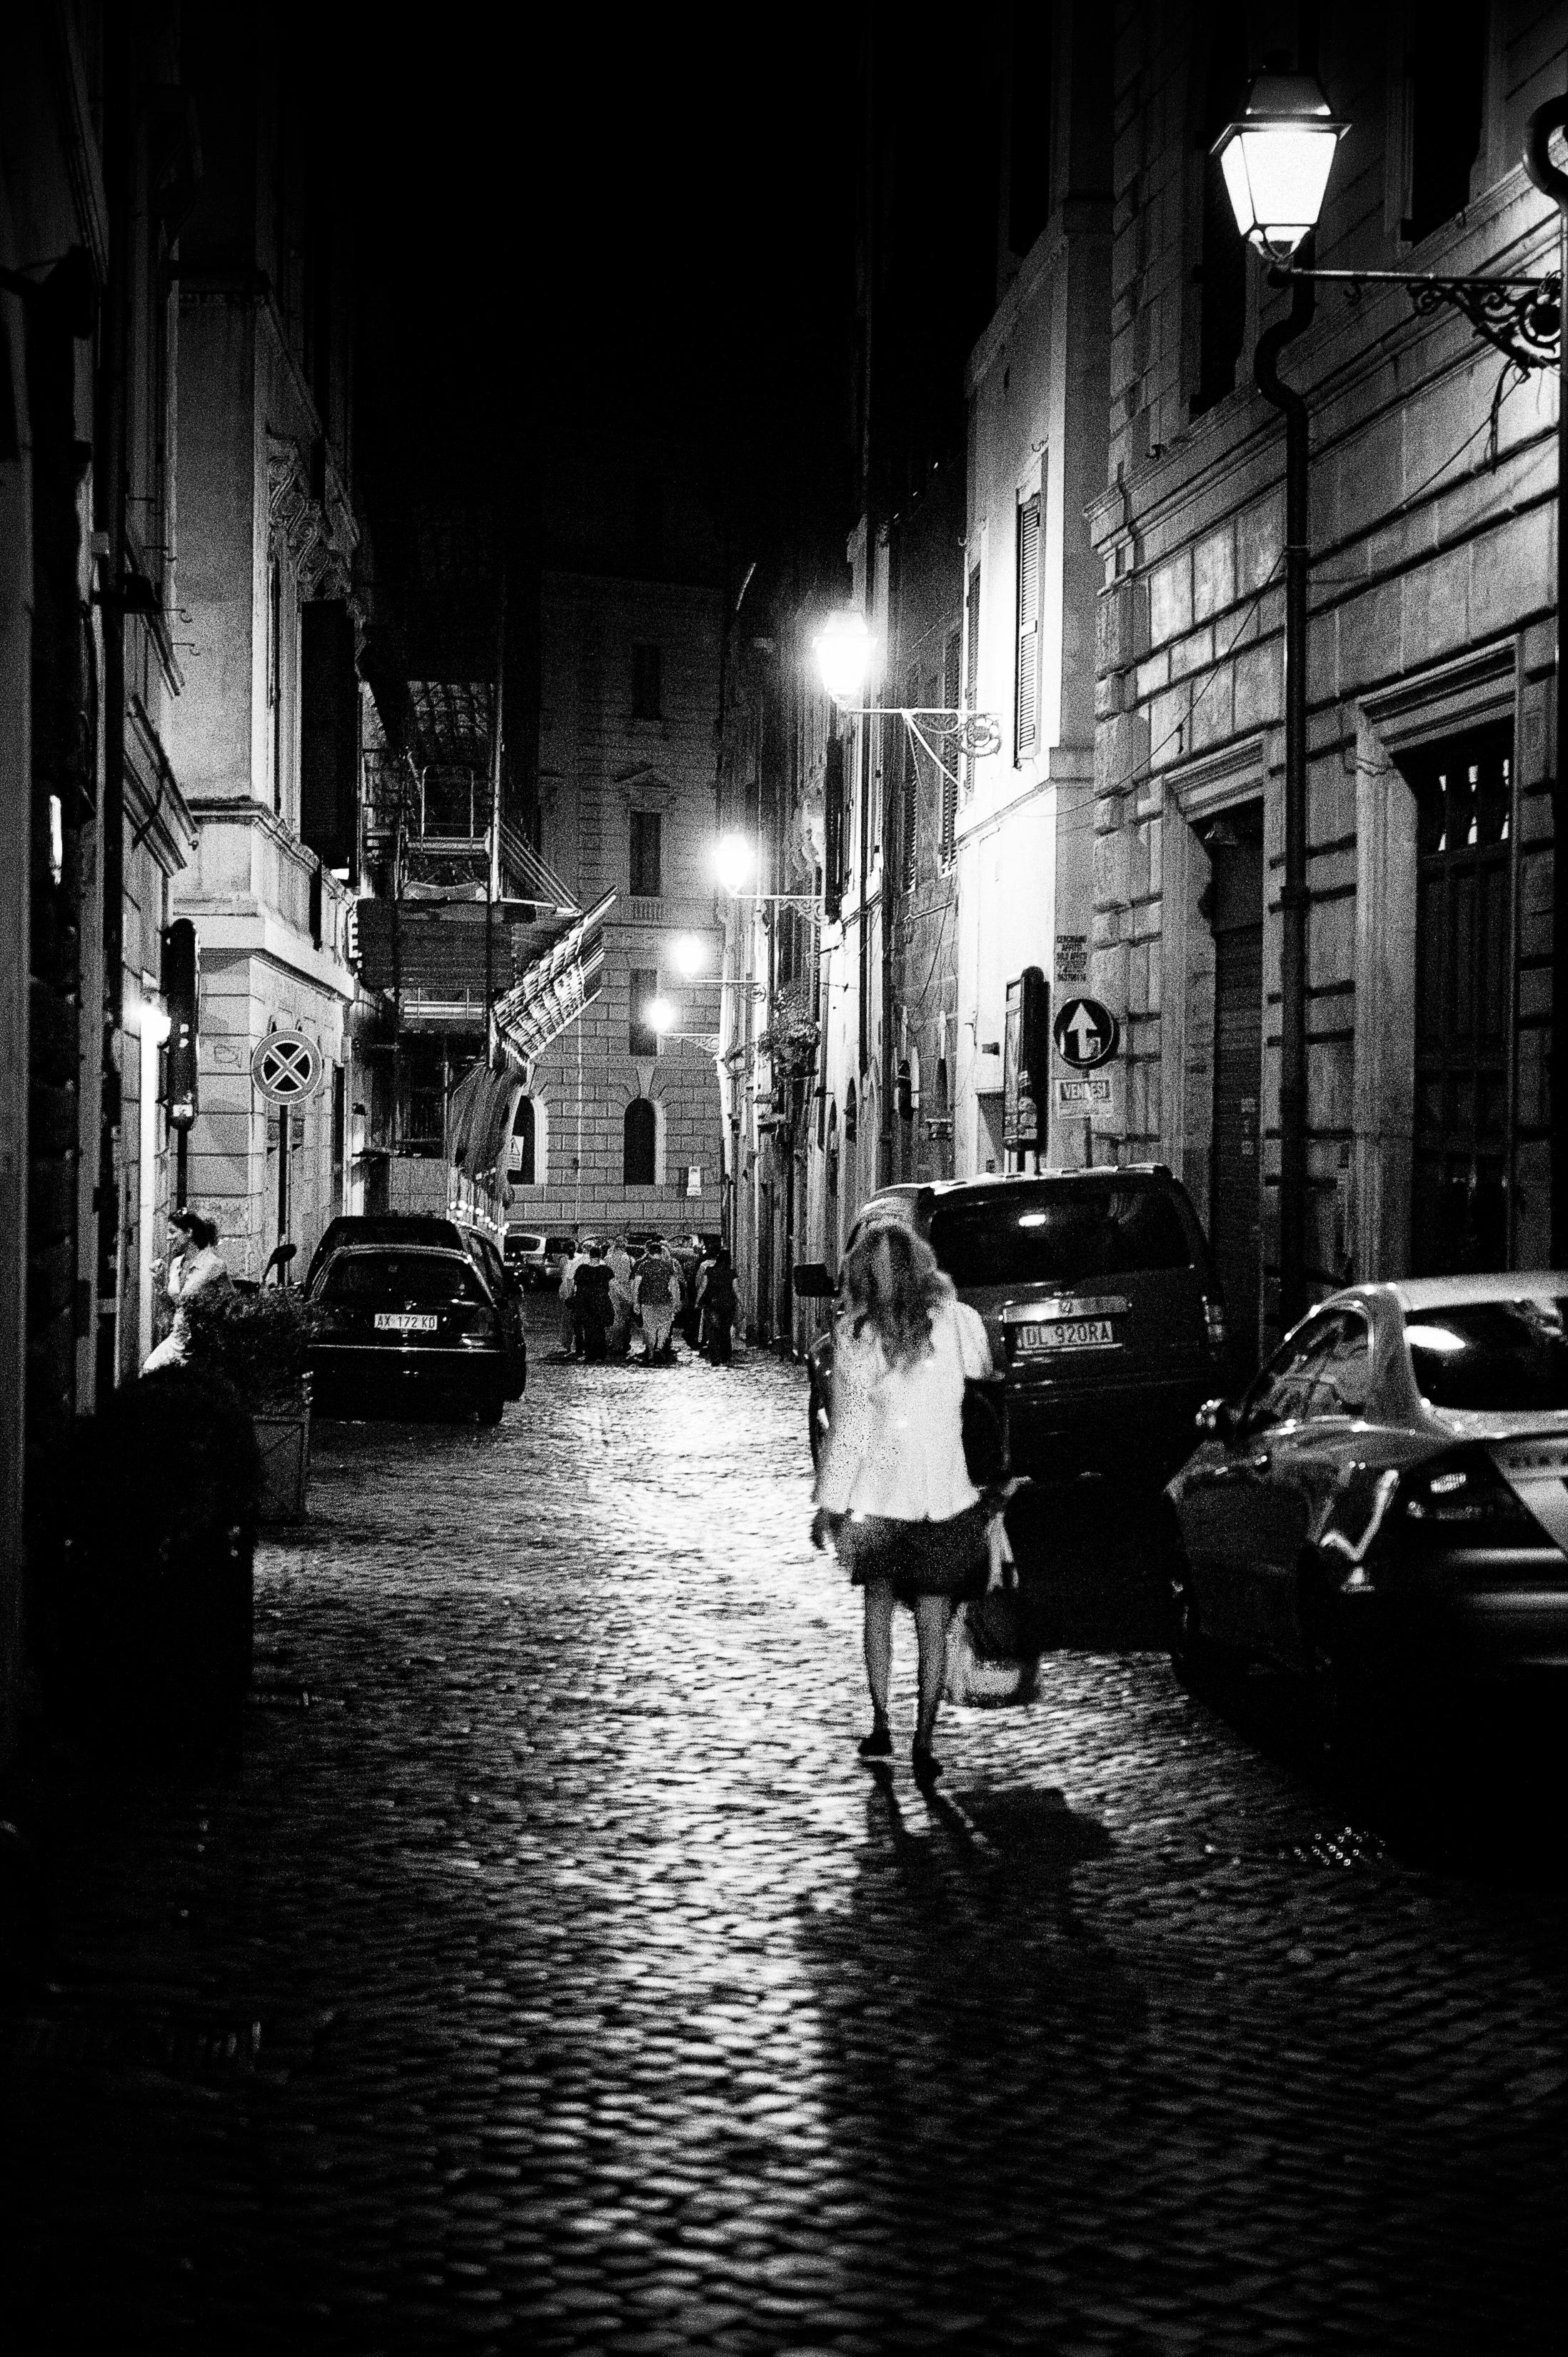 Italy-John Bardell-0796a.jpg